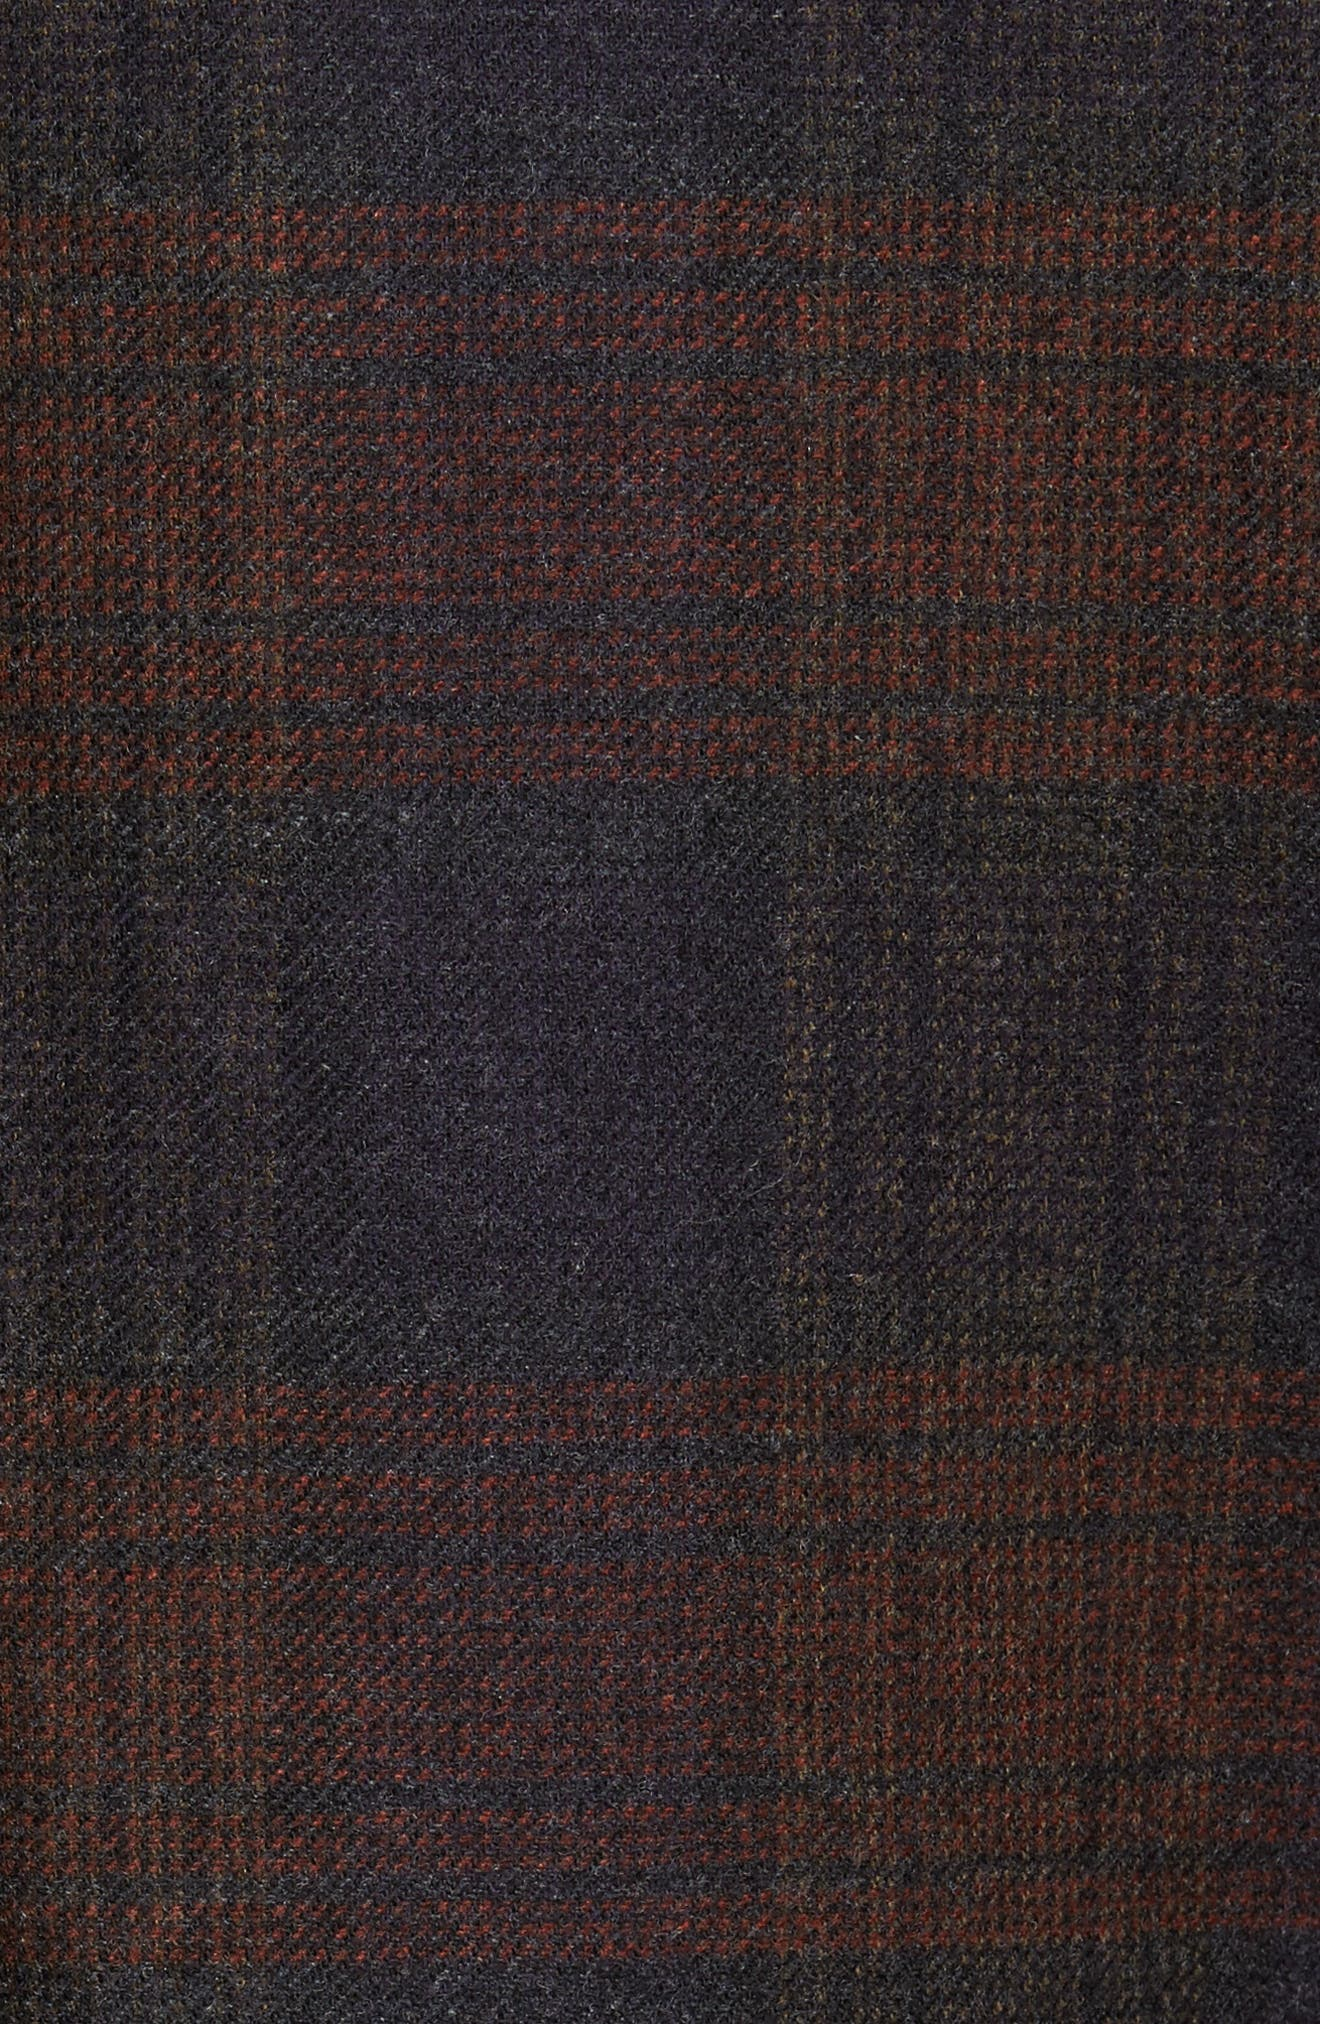 Plaid Wool Sport Coat,                             Alternate thumbnail 5, color,                             Charcoal